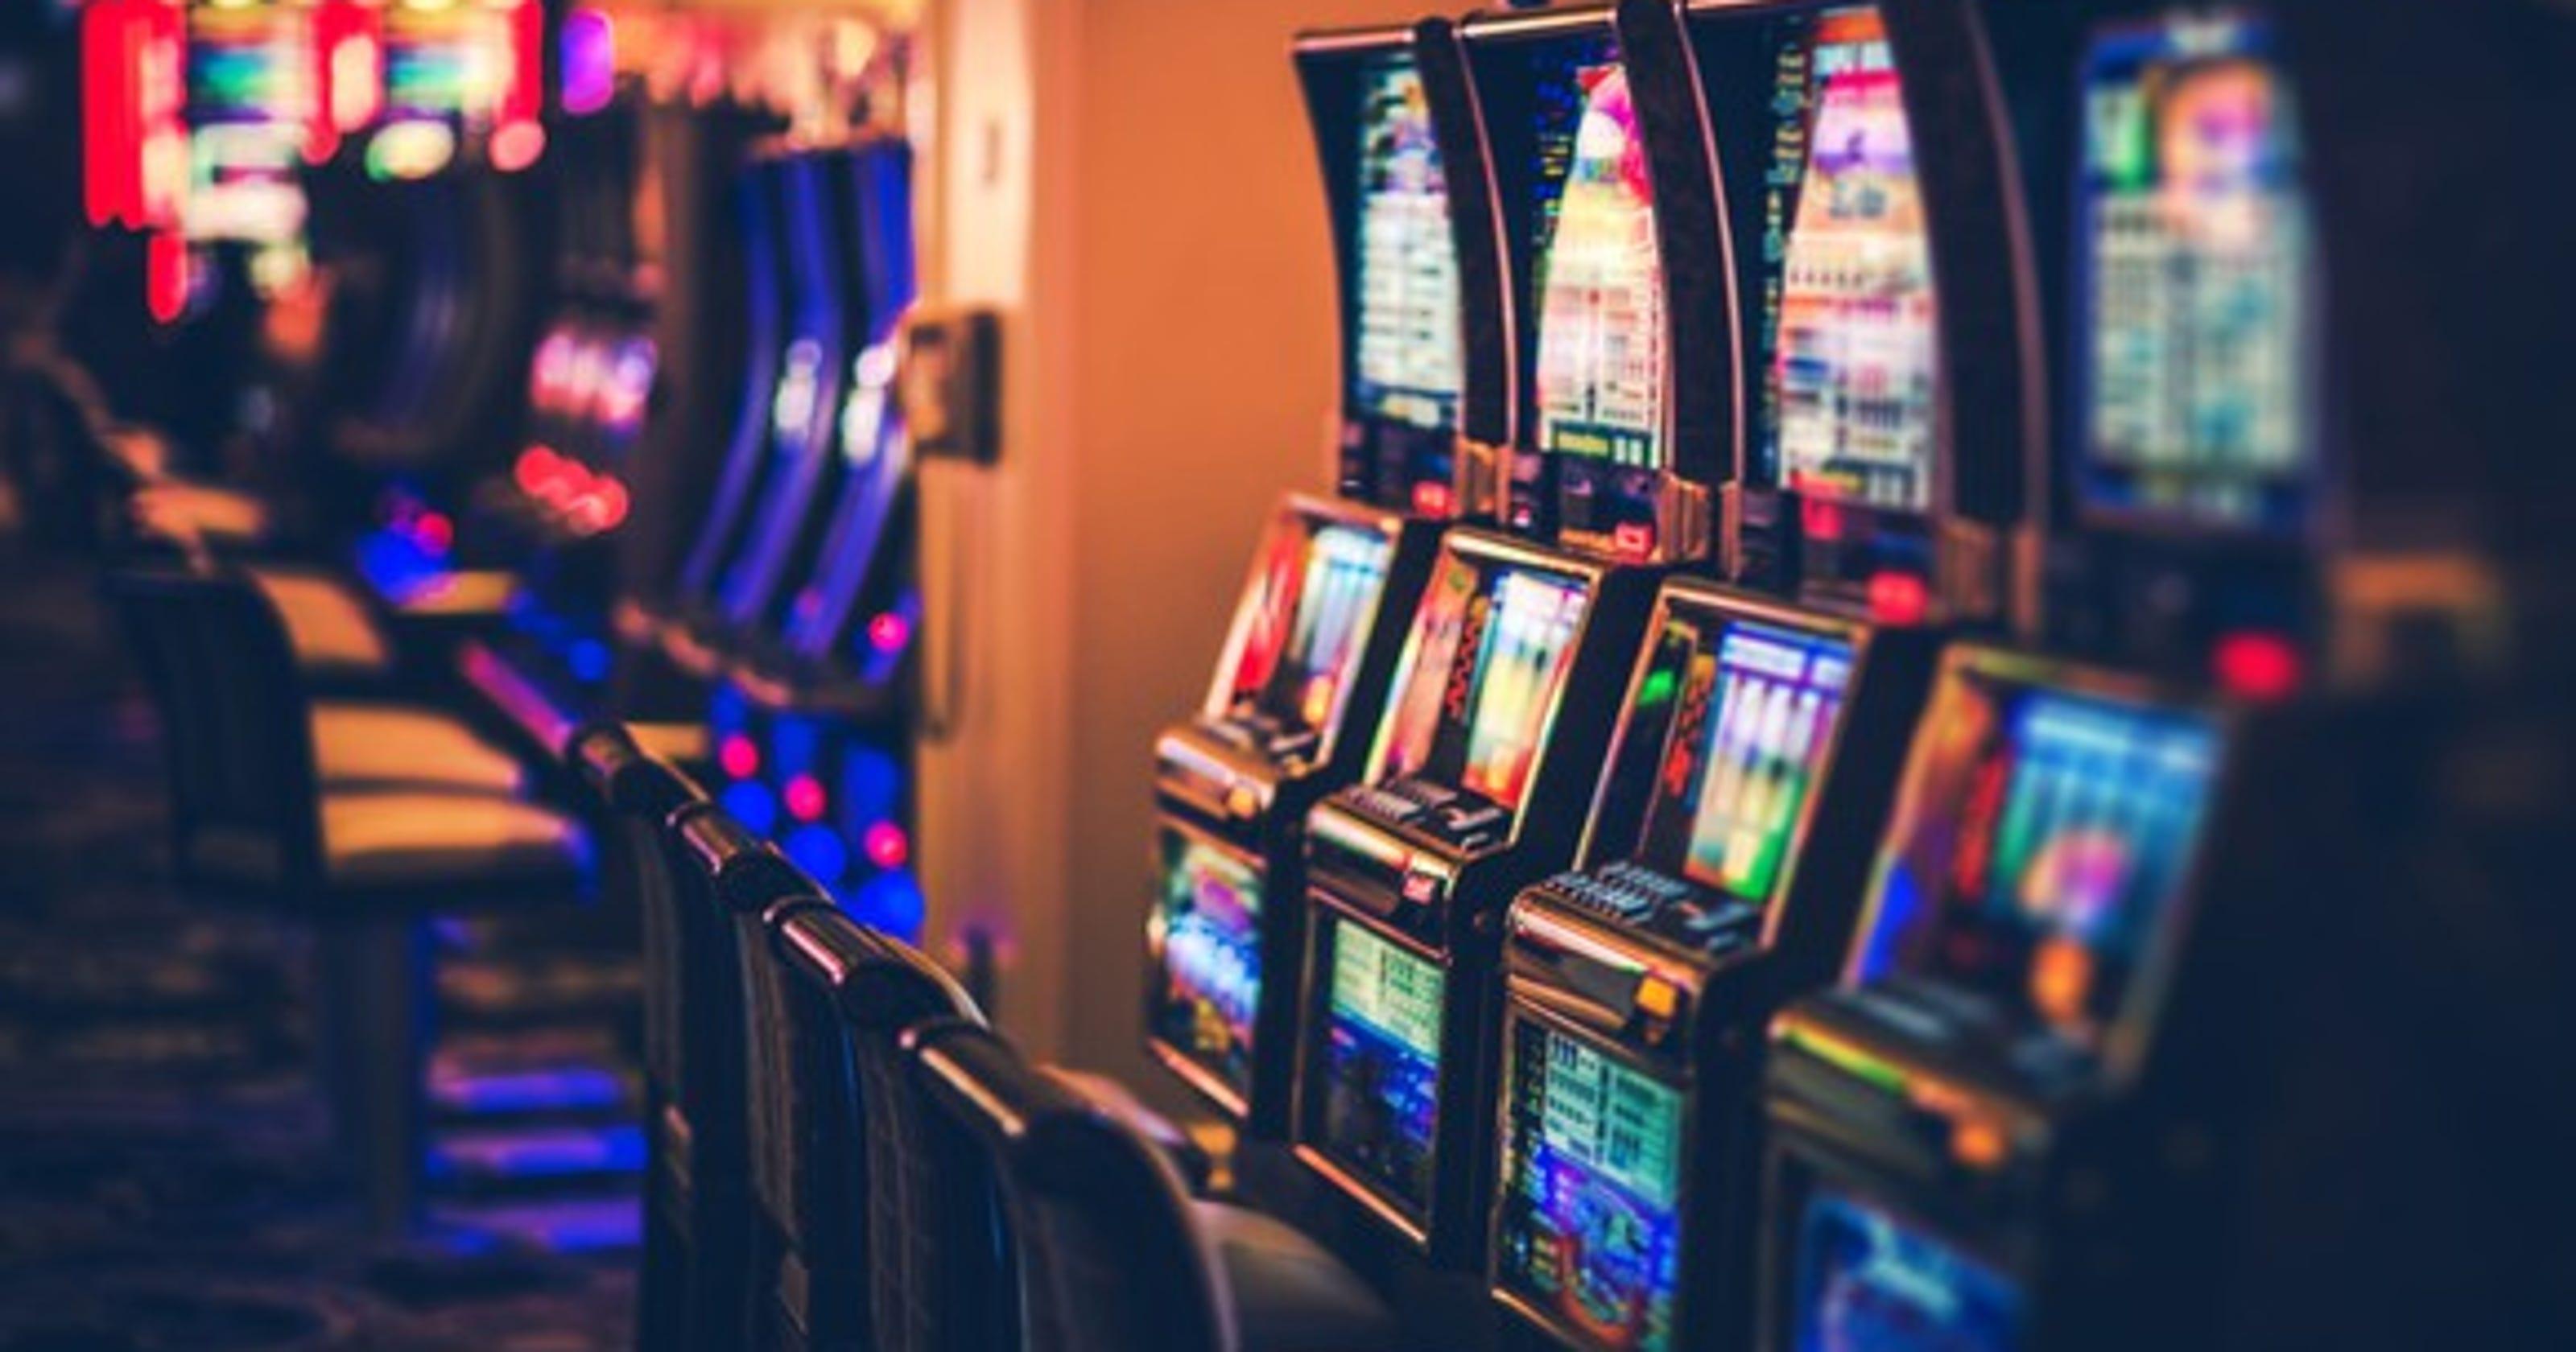 Postcode lotterie bewertungen